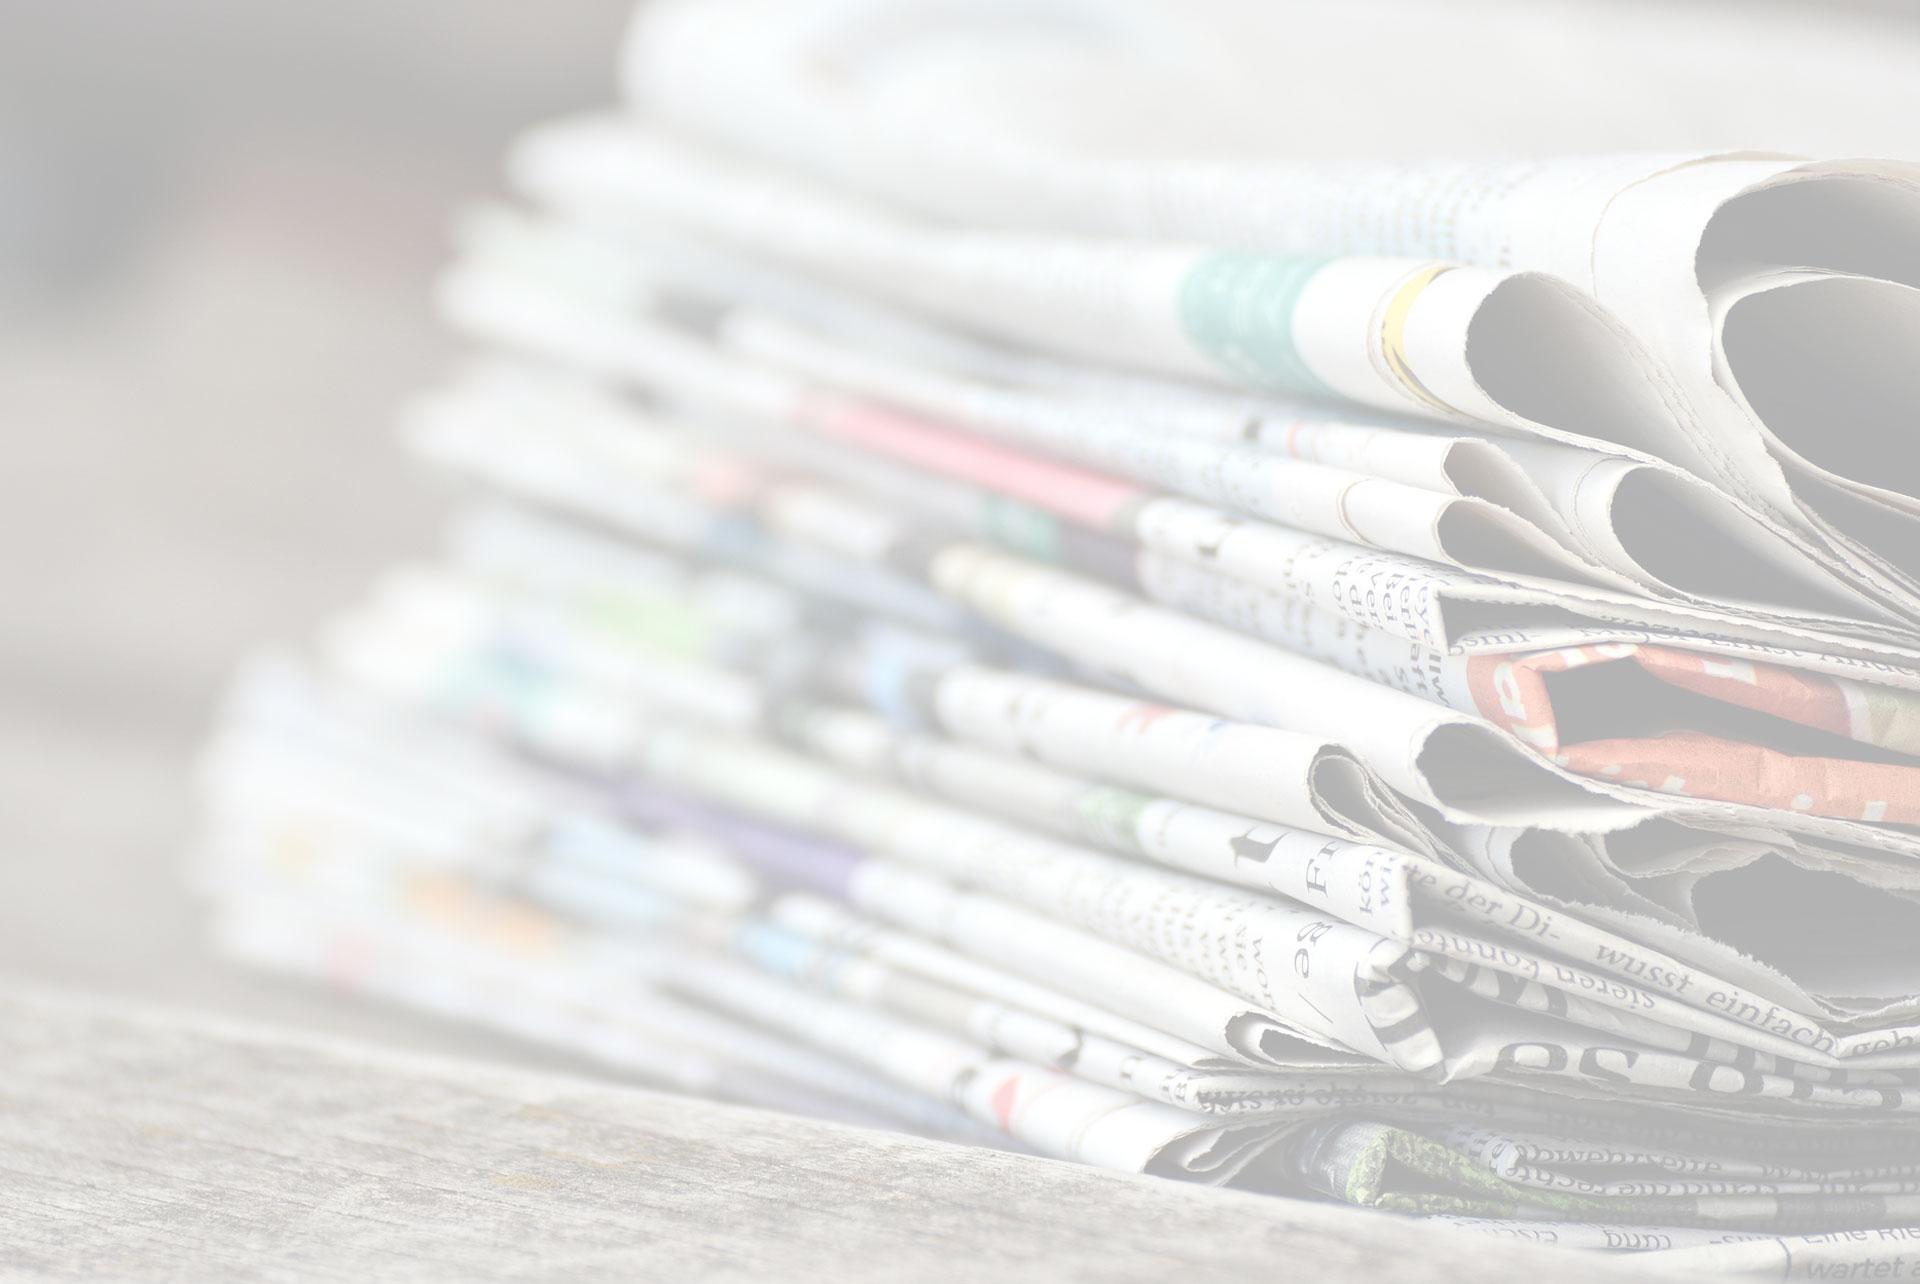 Pd Nicola Zingaretti